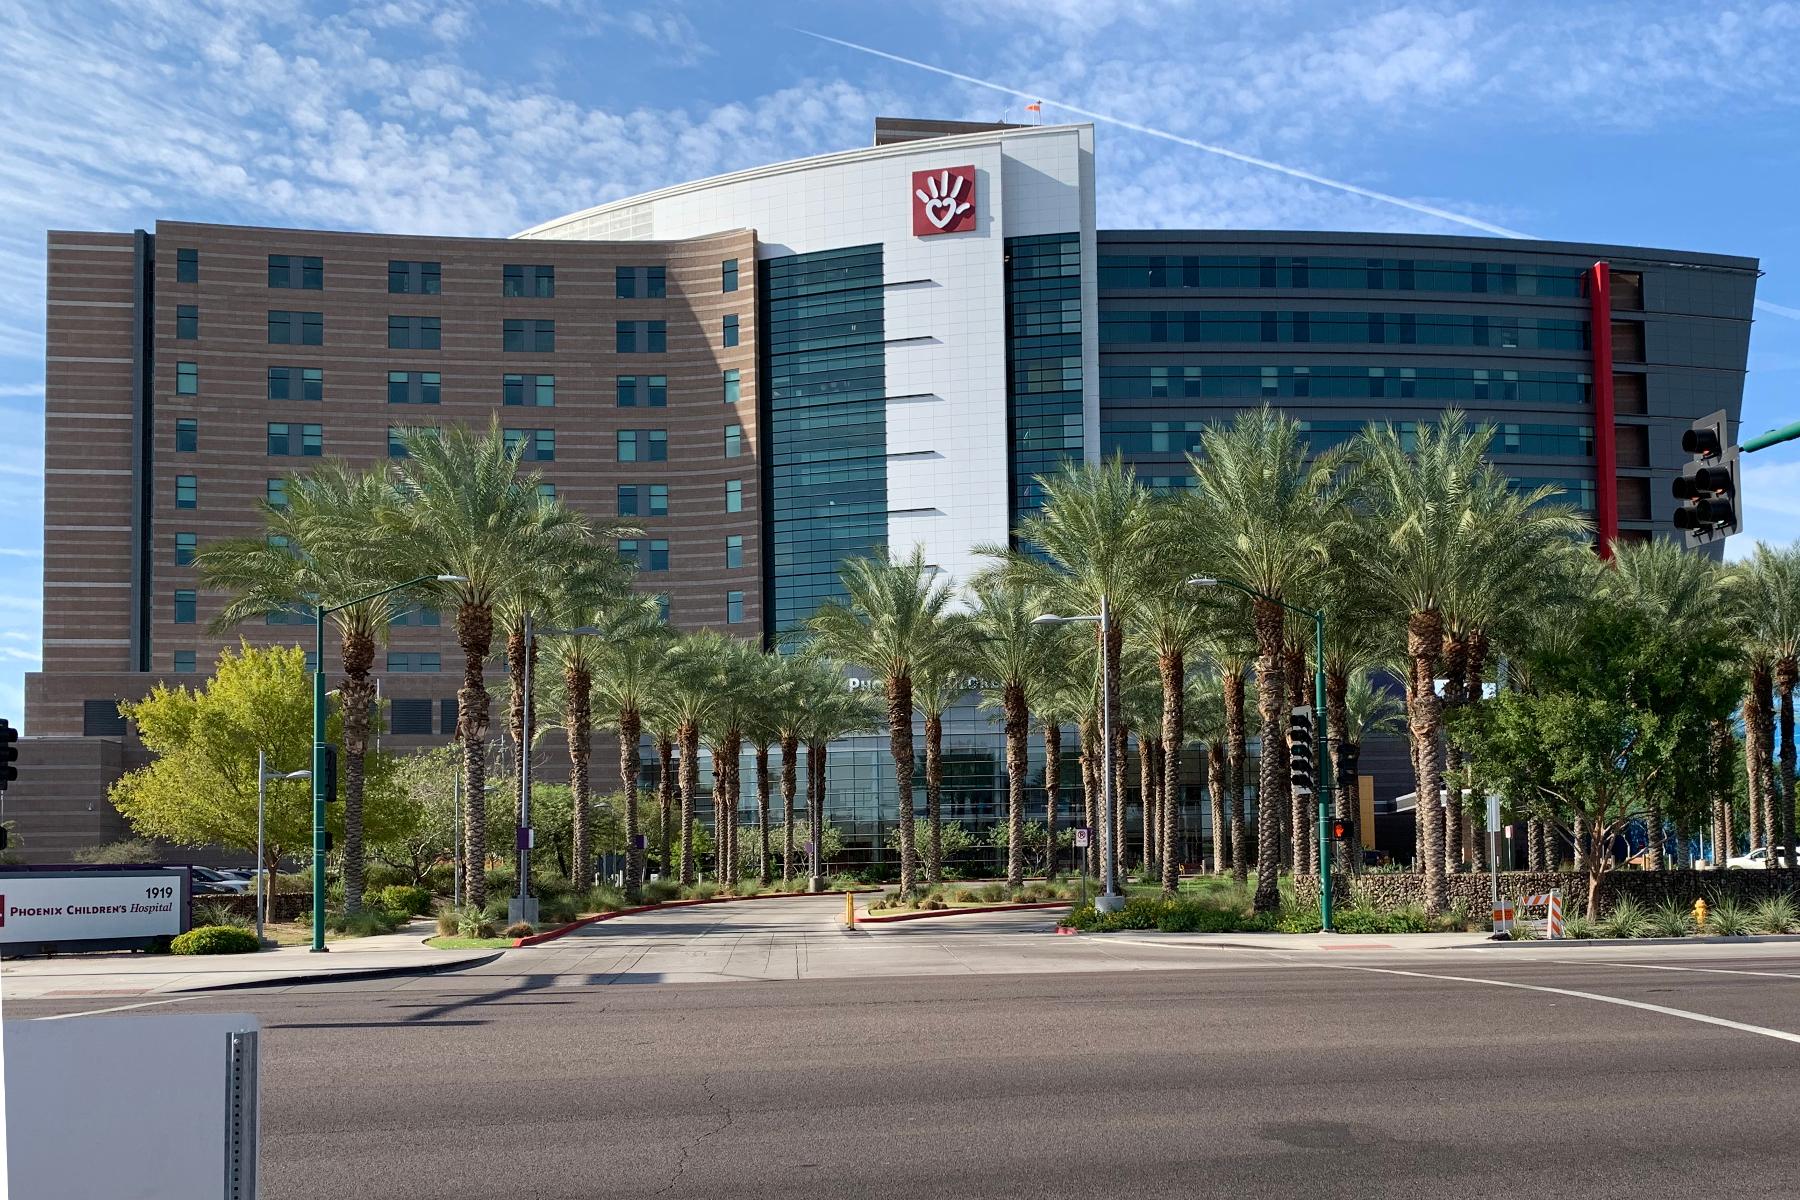 Megger Donates $10,000 to Phoenix Children's Hospital Foundation